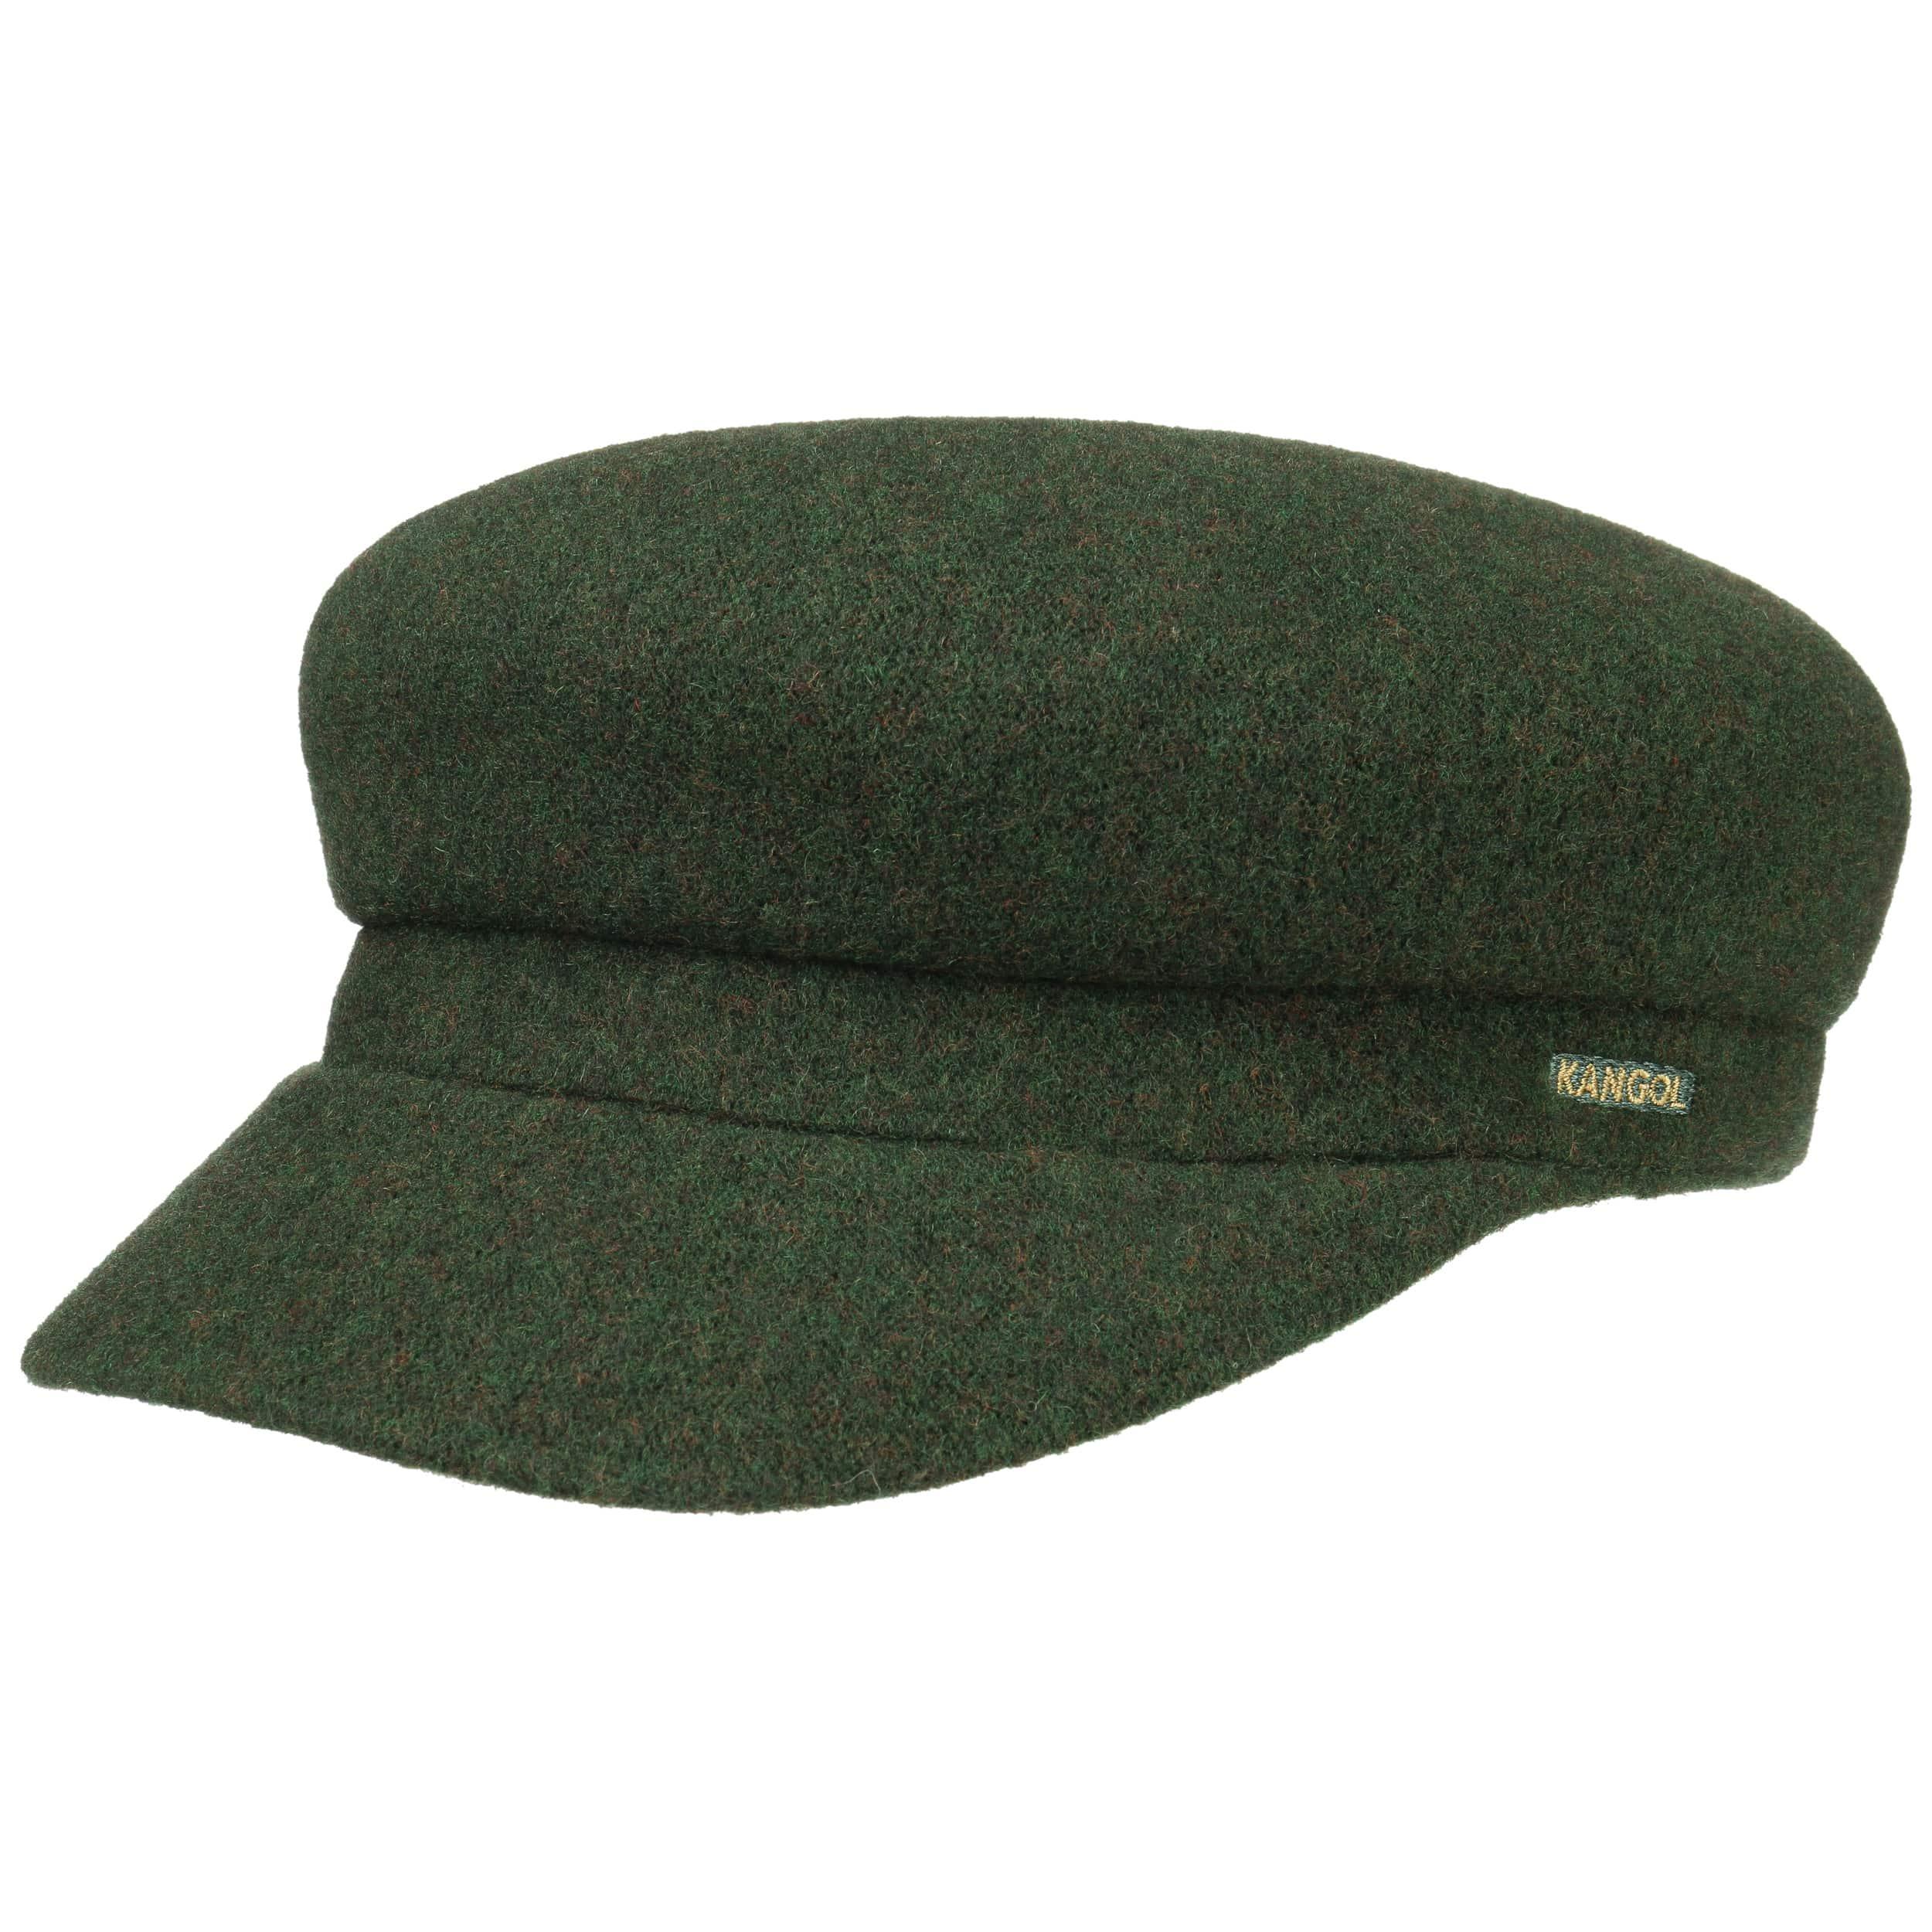 ... Wool Enfield Newsboy Cap by Kangol - dark green 4 ... 1aeab11c9c4